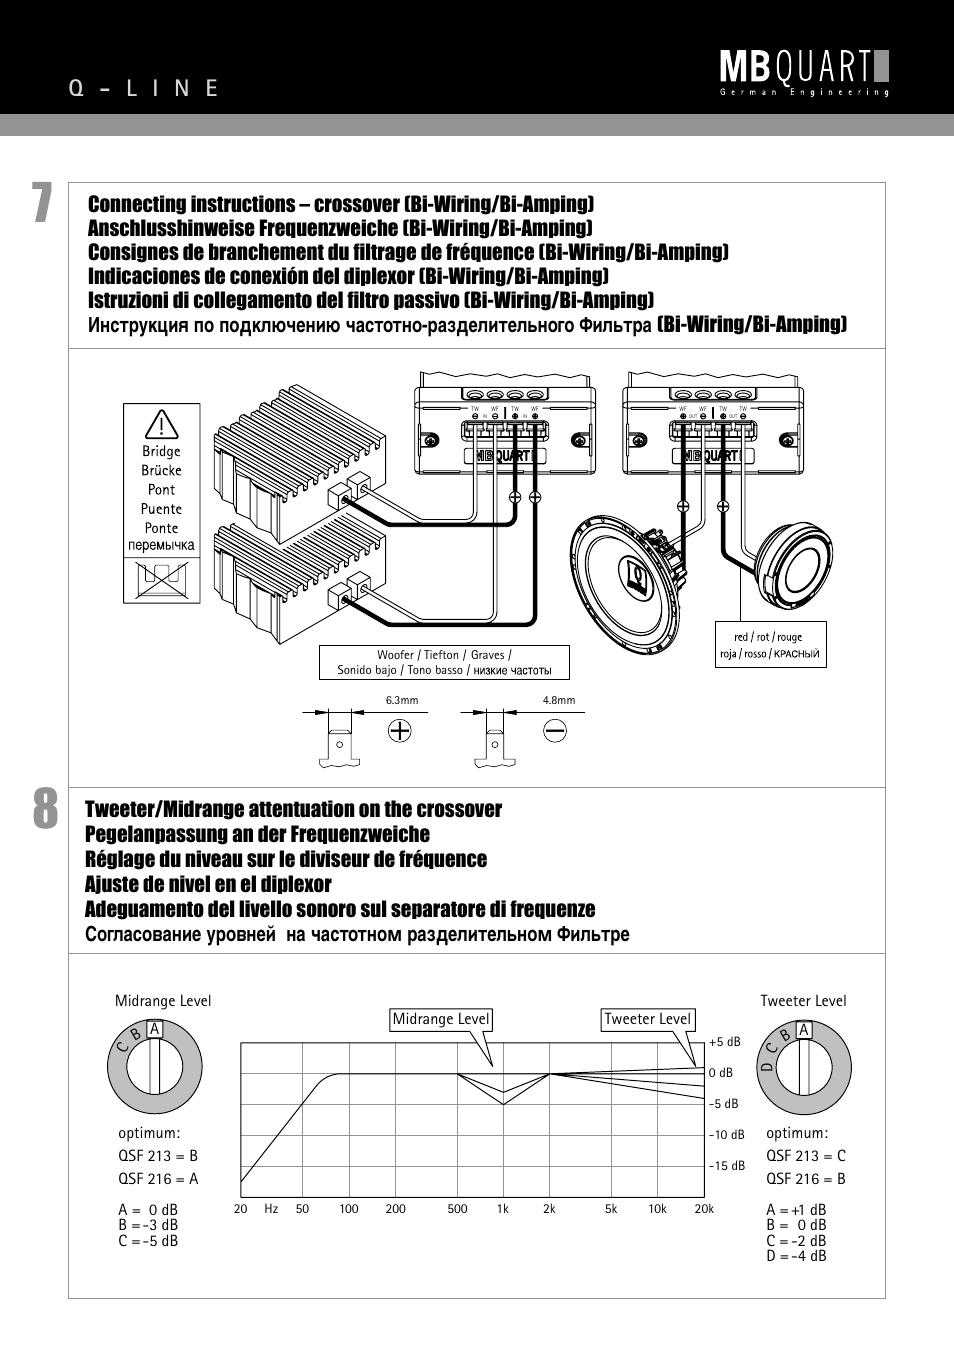 Q - l i n e | MB QUART Q - LINE QSF 213 User Manual | Page 2 / 9